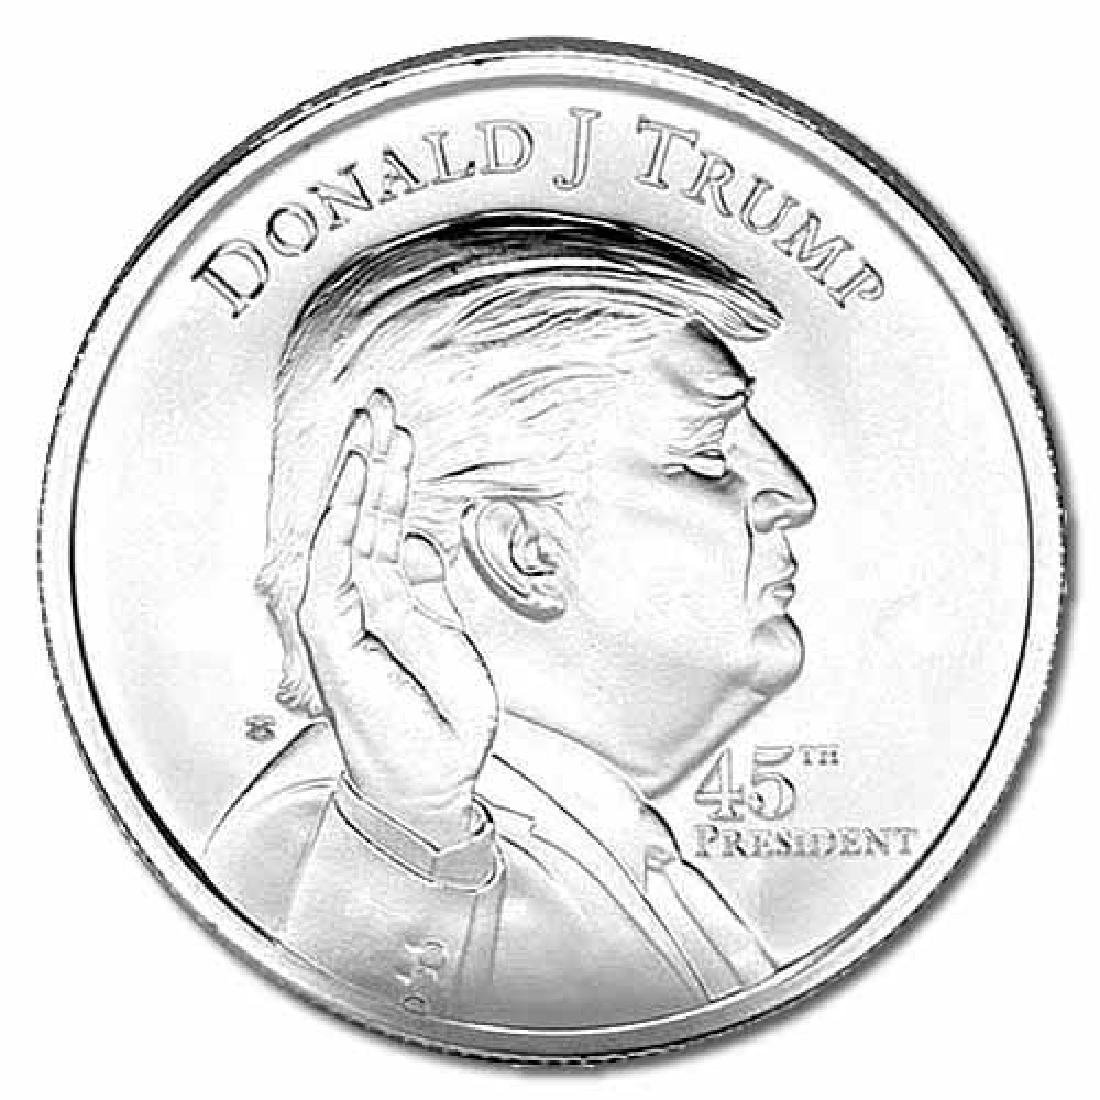 Donald Trump Silver Round 1 oz - Elemetal Mint